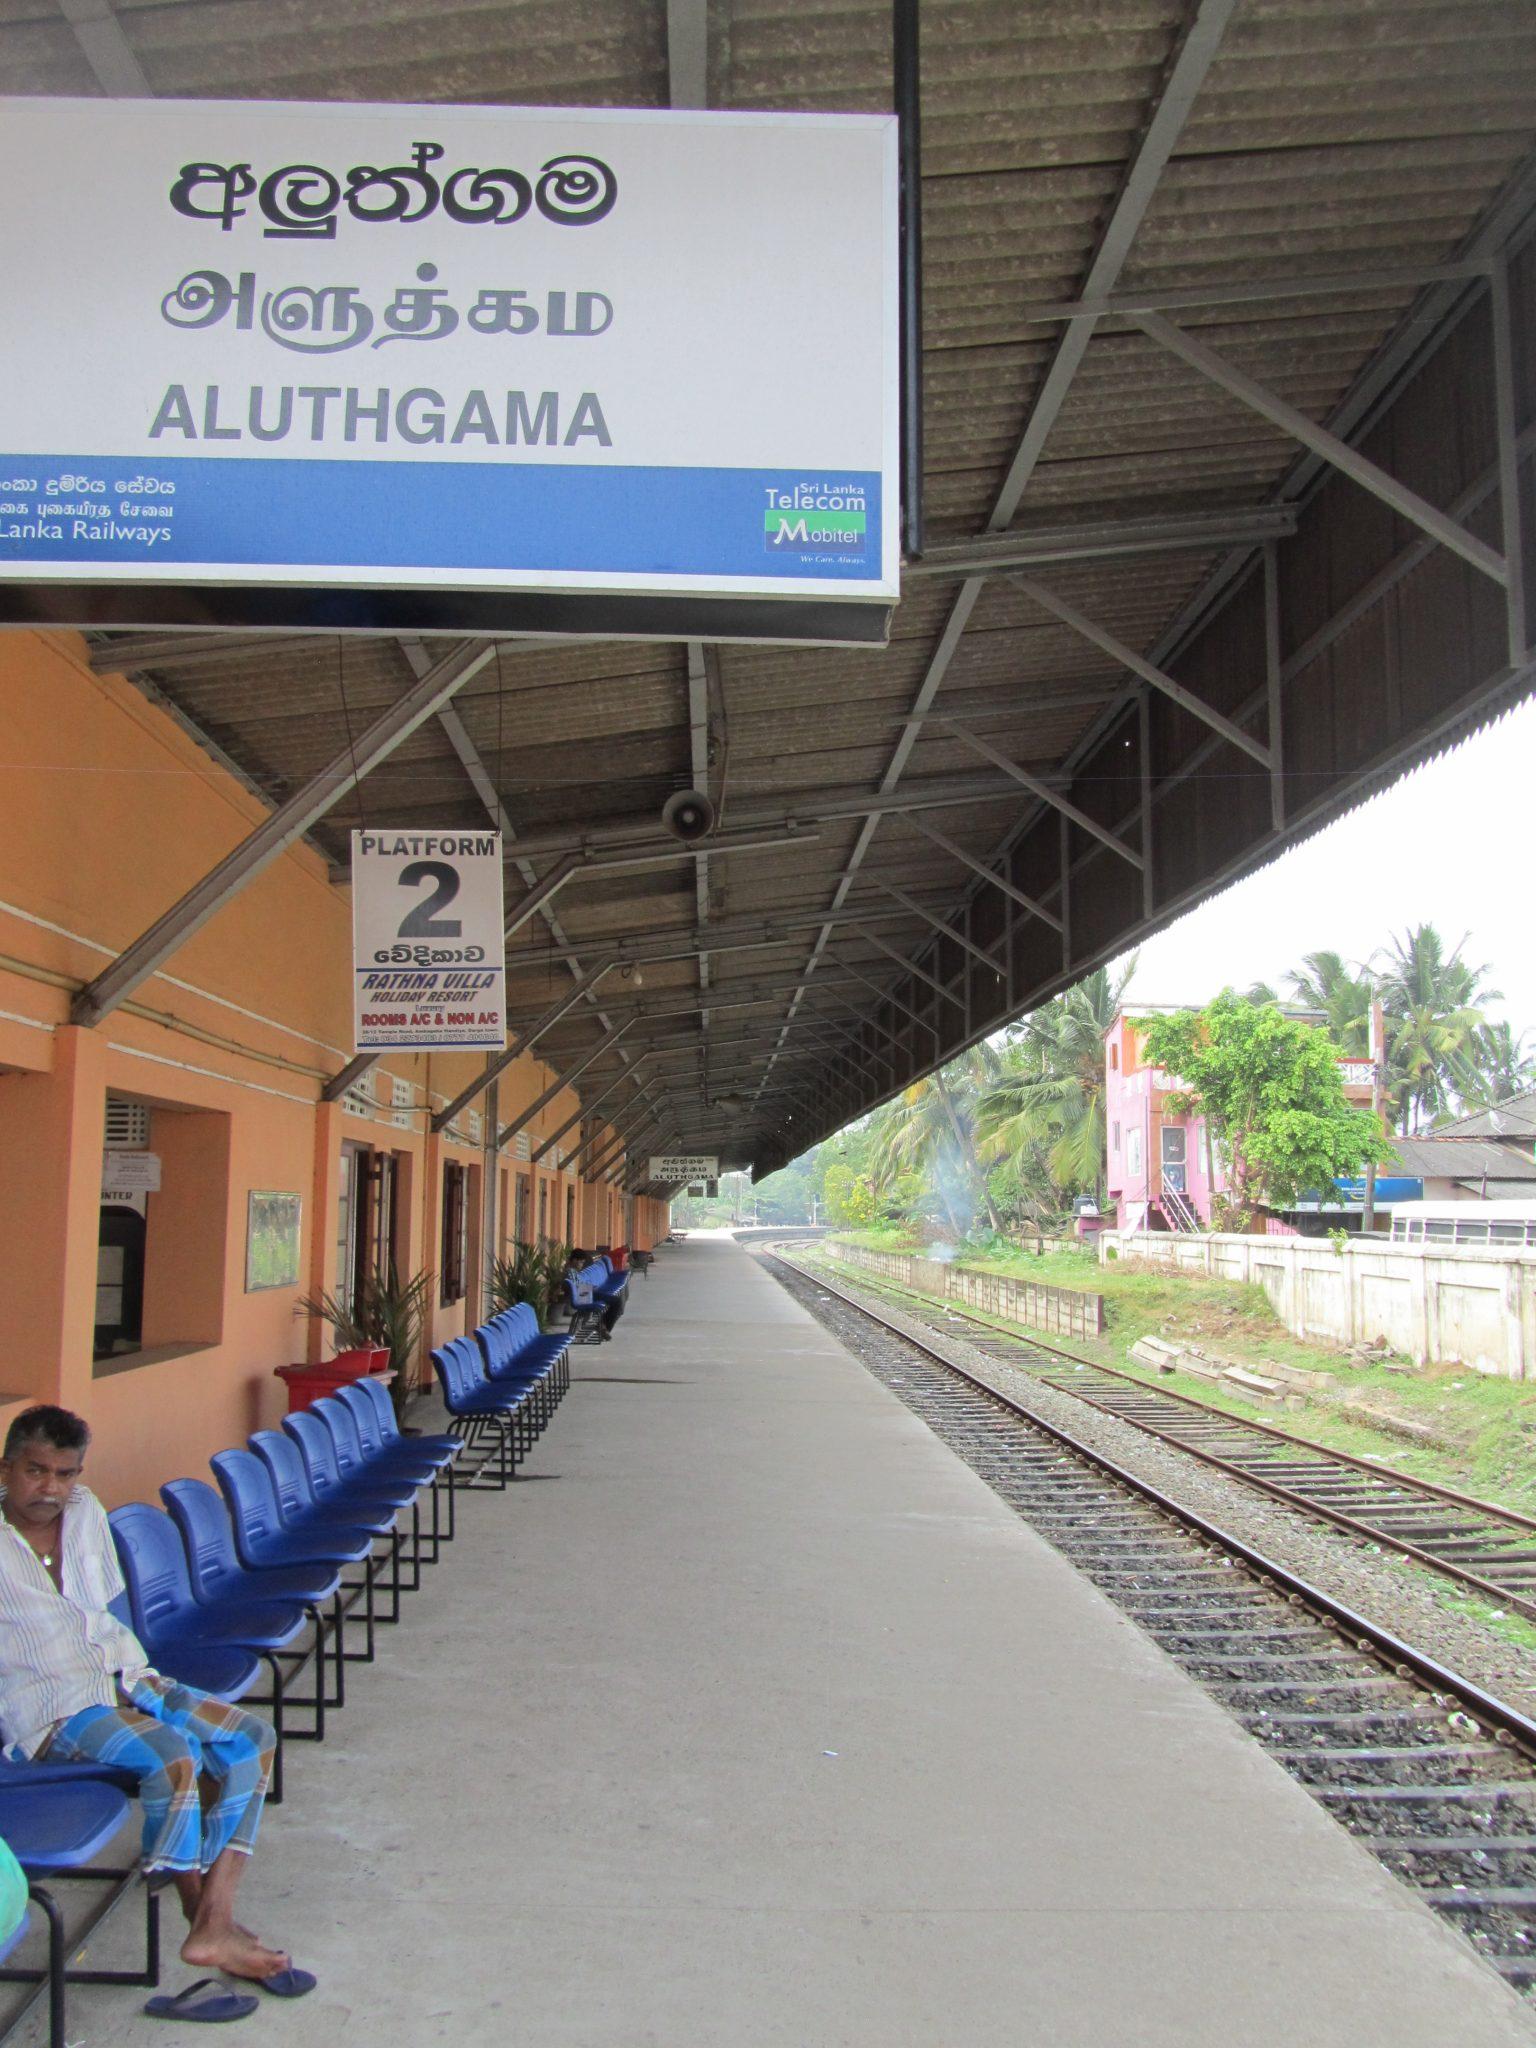 Aluthgama Train Station, Sri Lanka